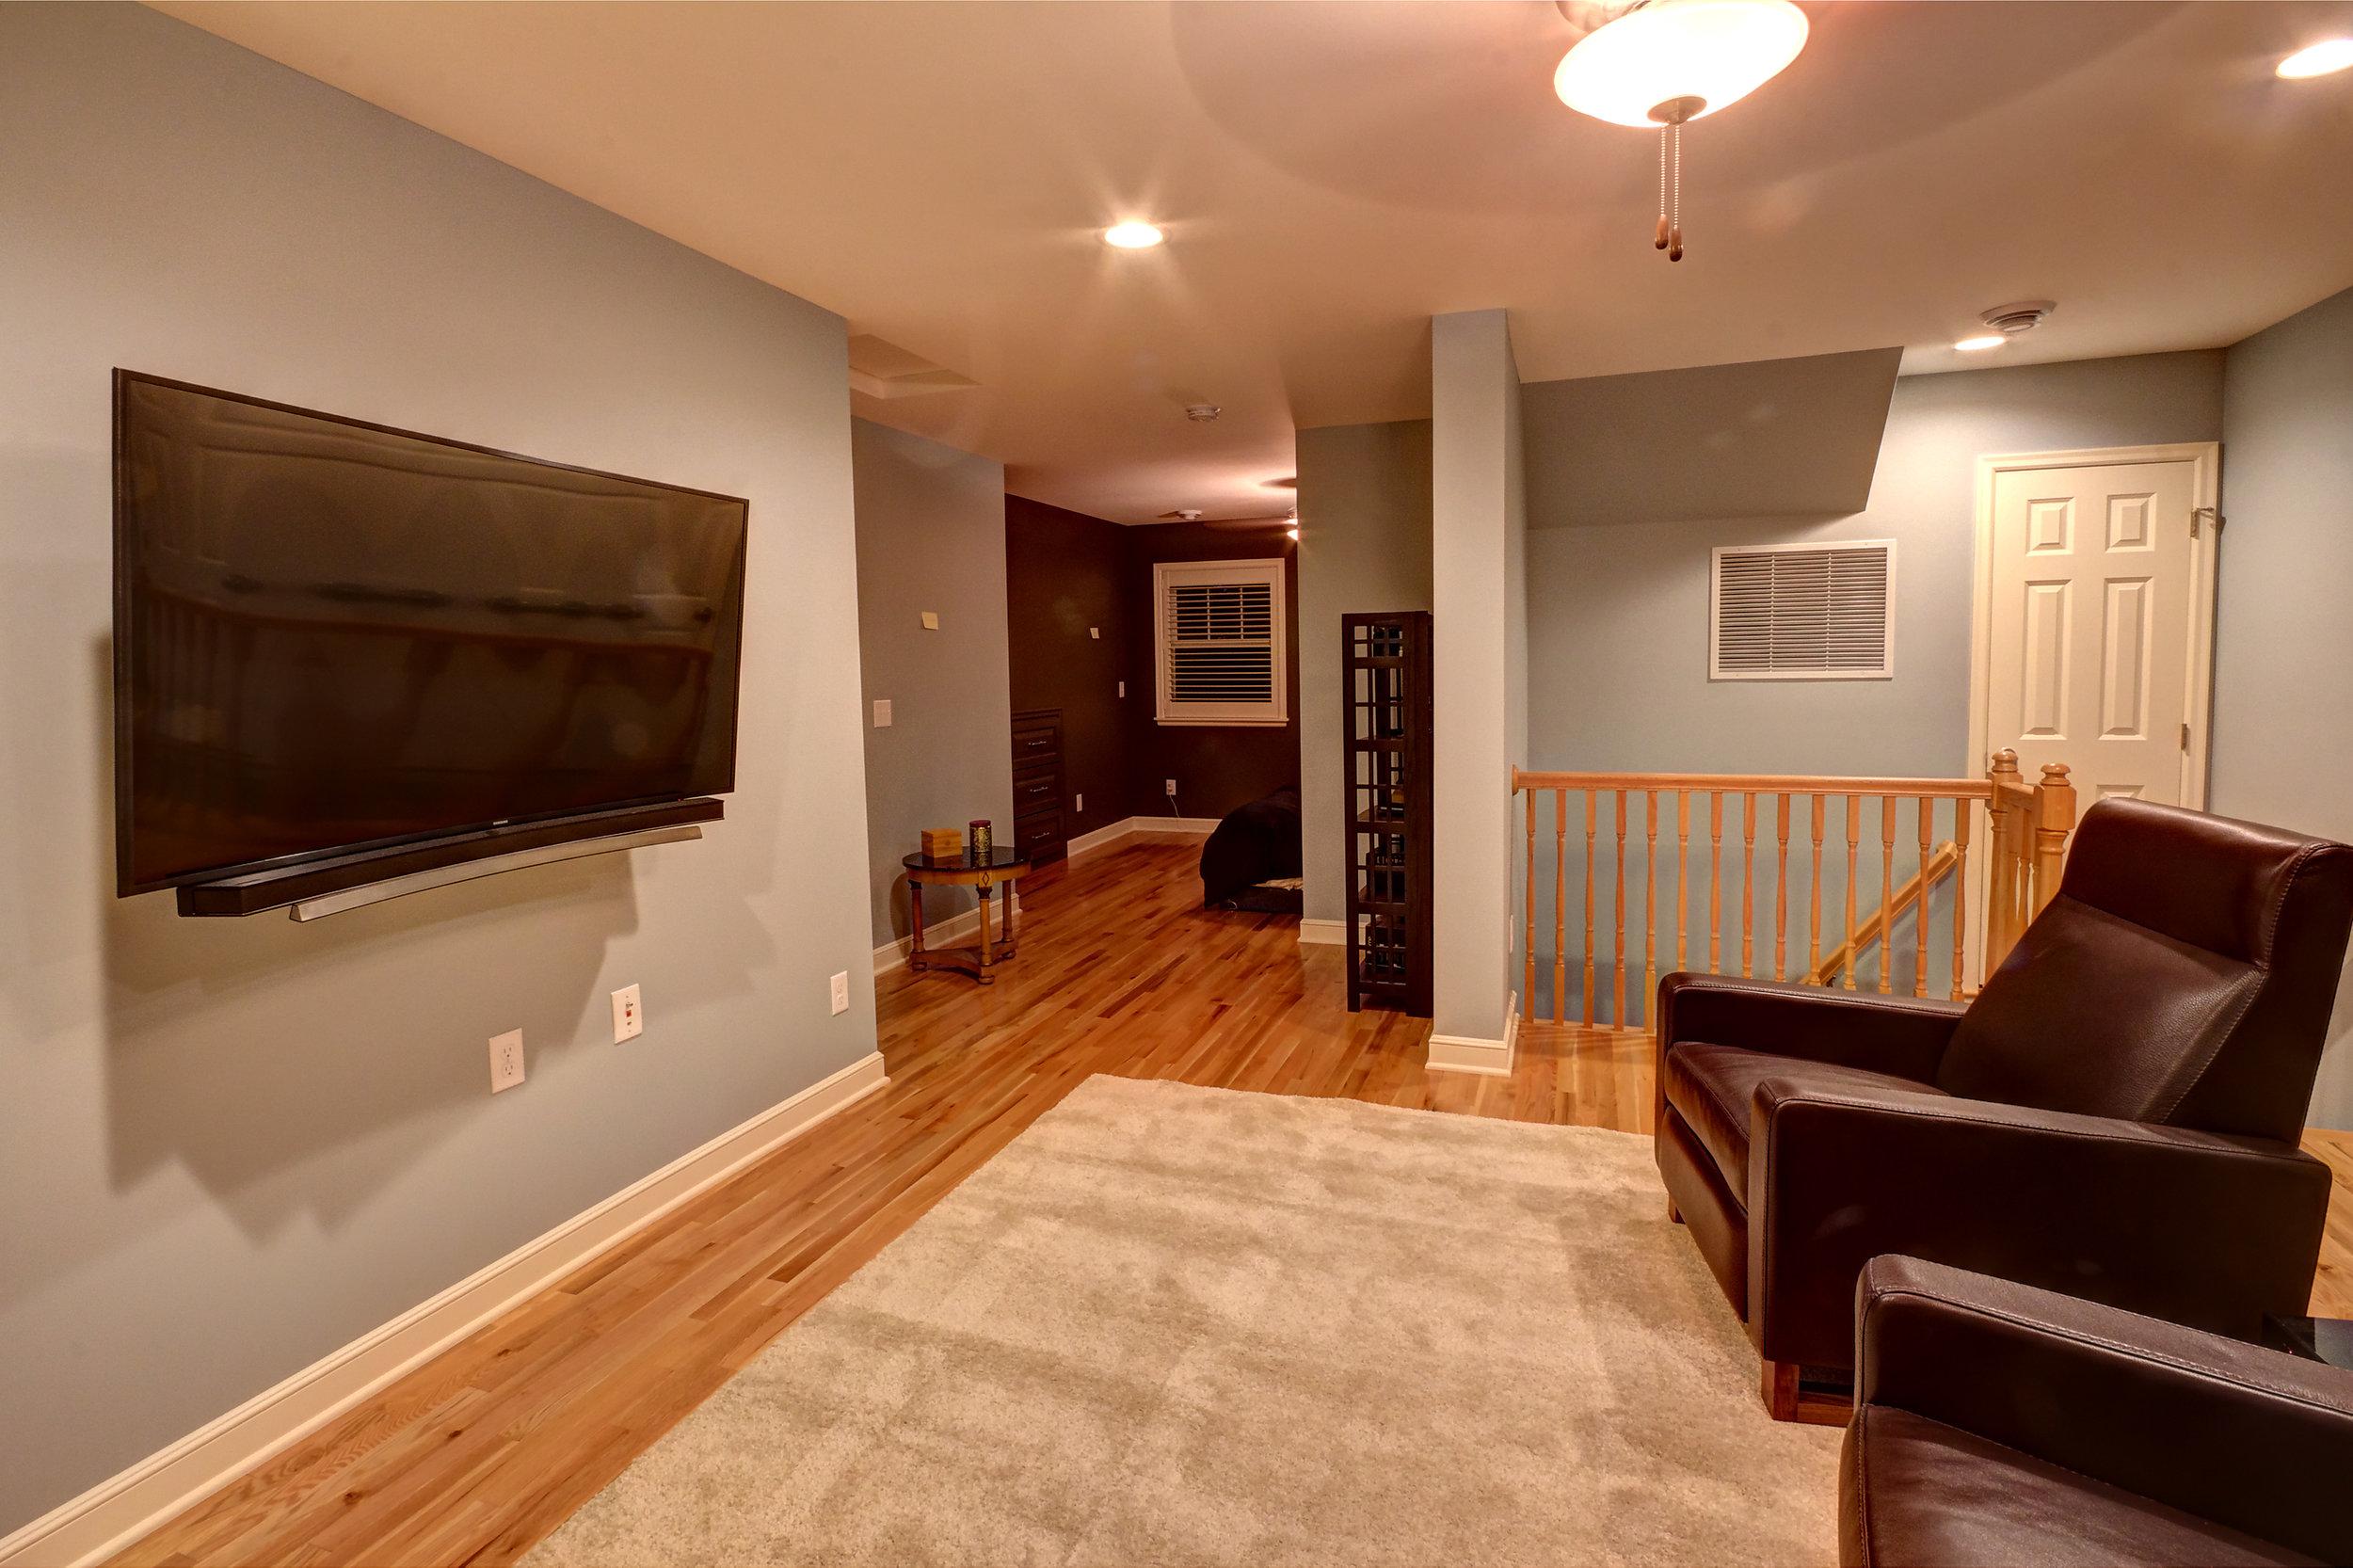 Interior Attic, Family rm (bar view).jpg